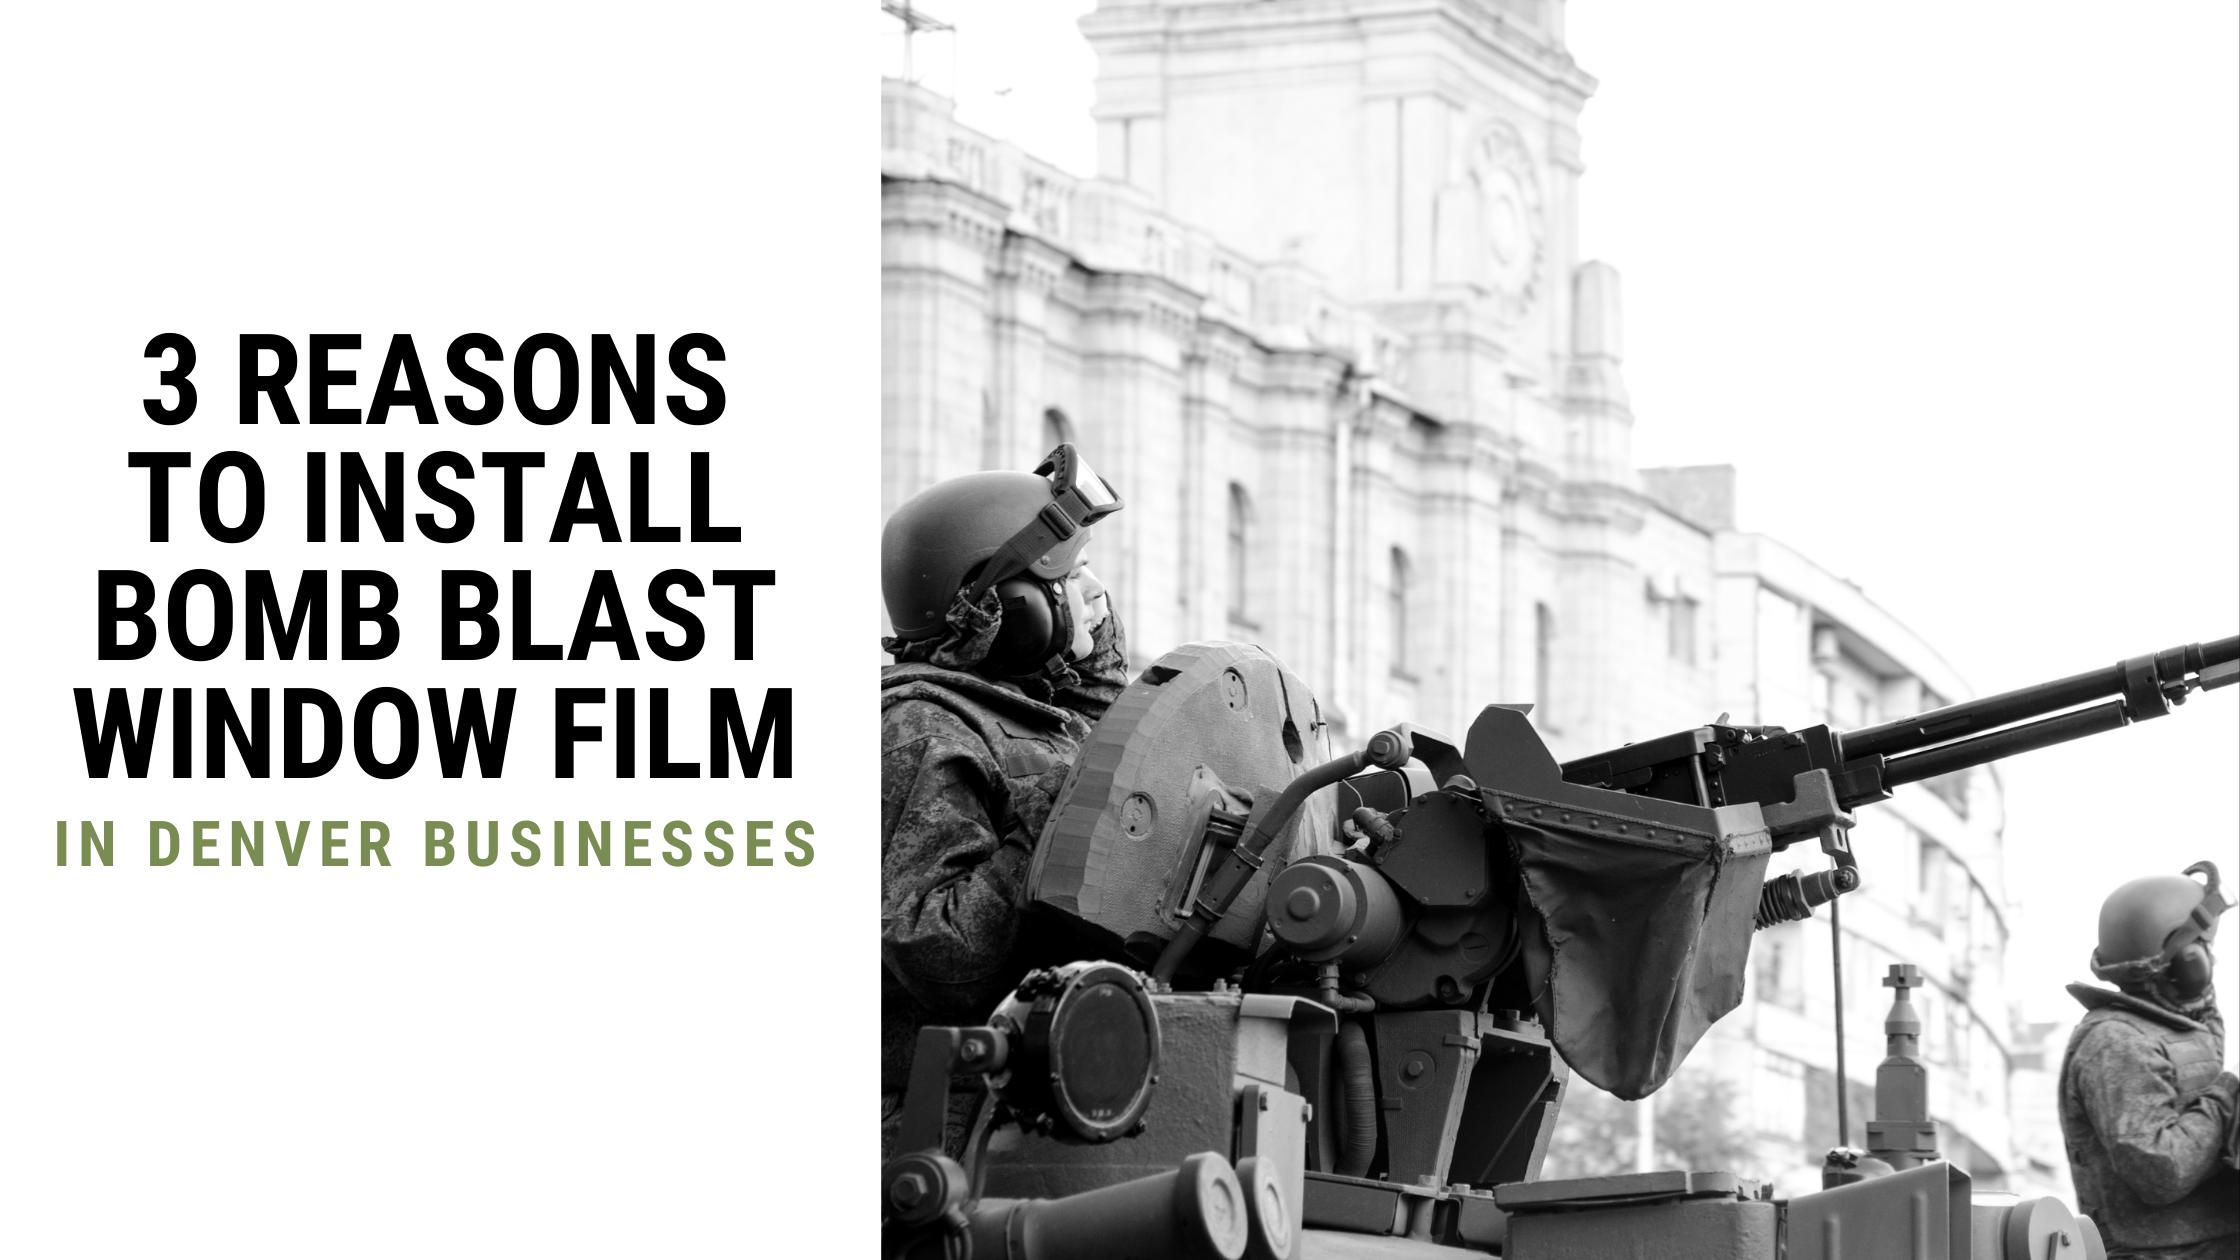 3 Reasons to Install Bomb Blast Window Film in Denver Businesses